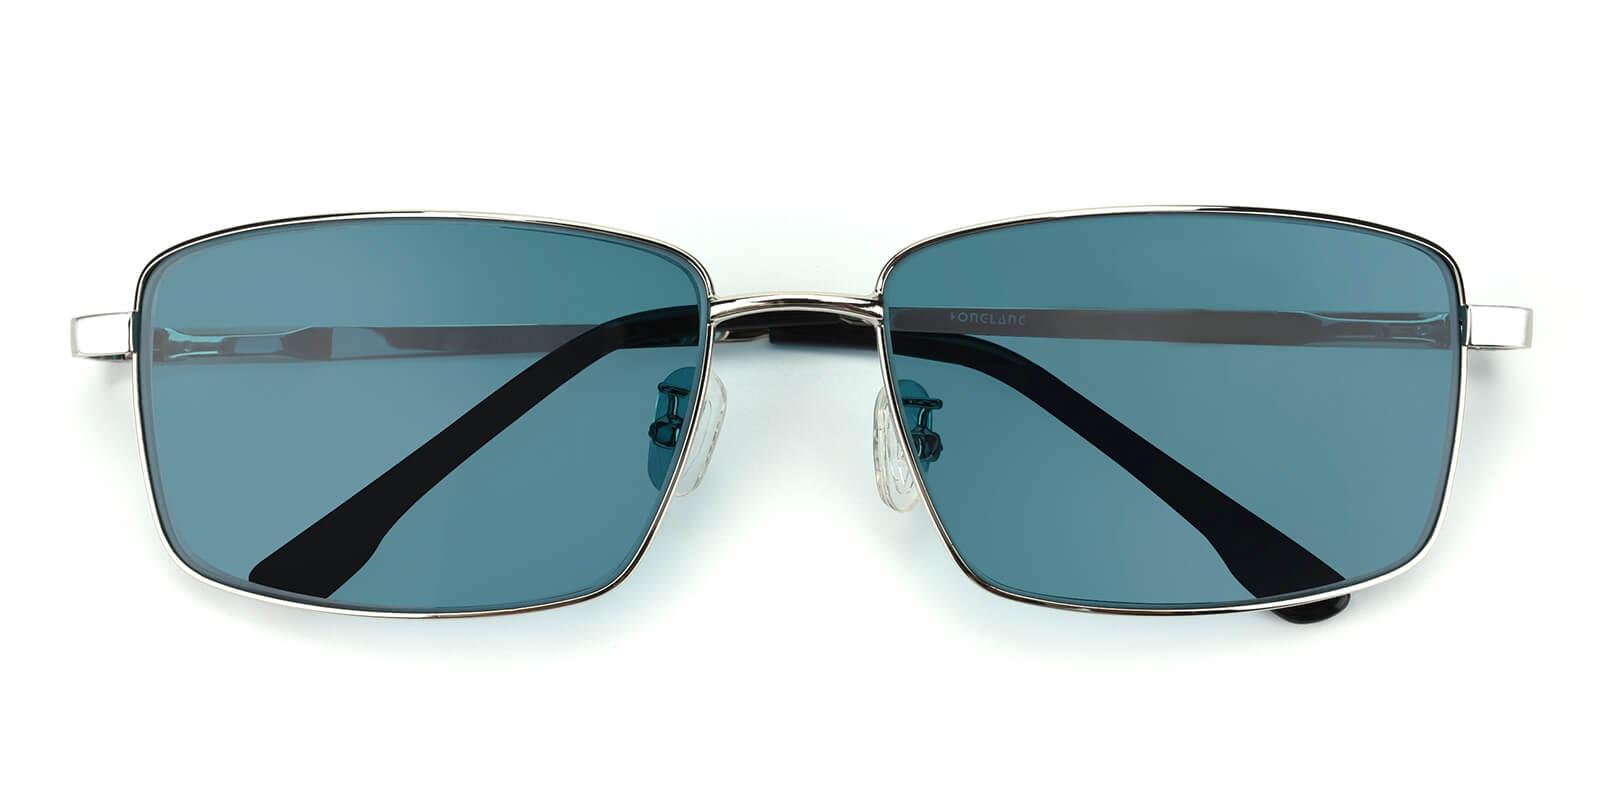 Sea-Silver-Rectangle-Metal-Sunglasses-detail